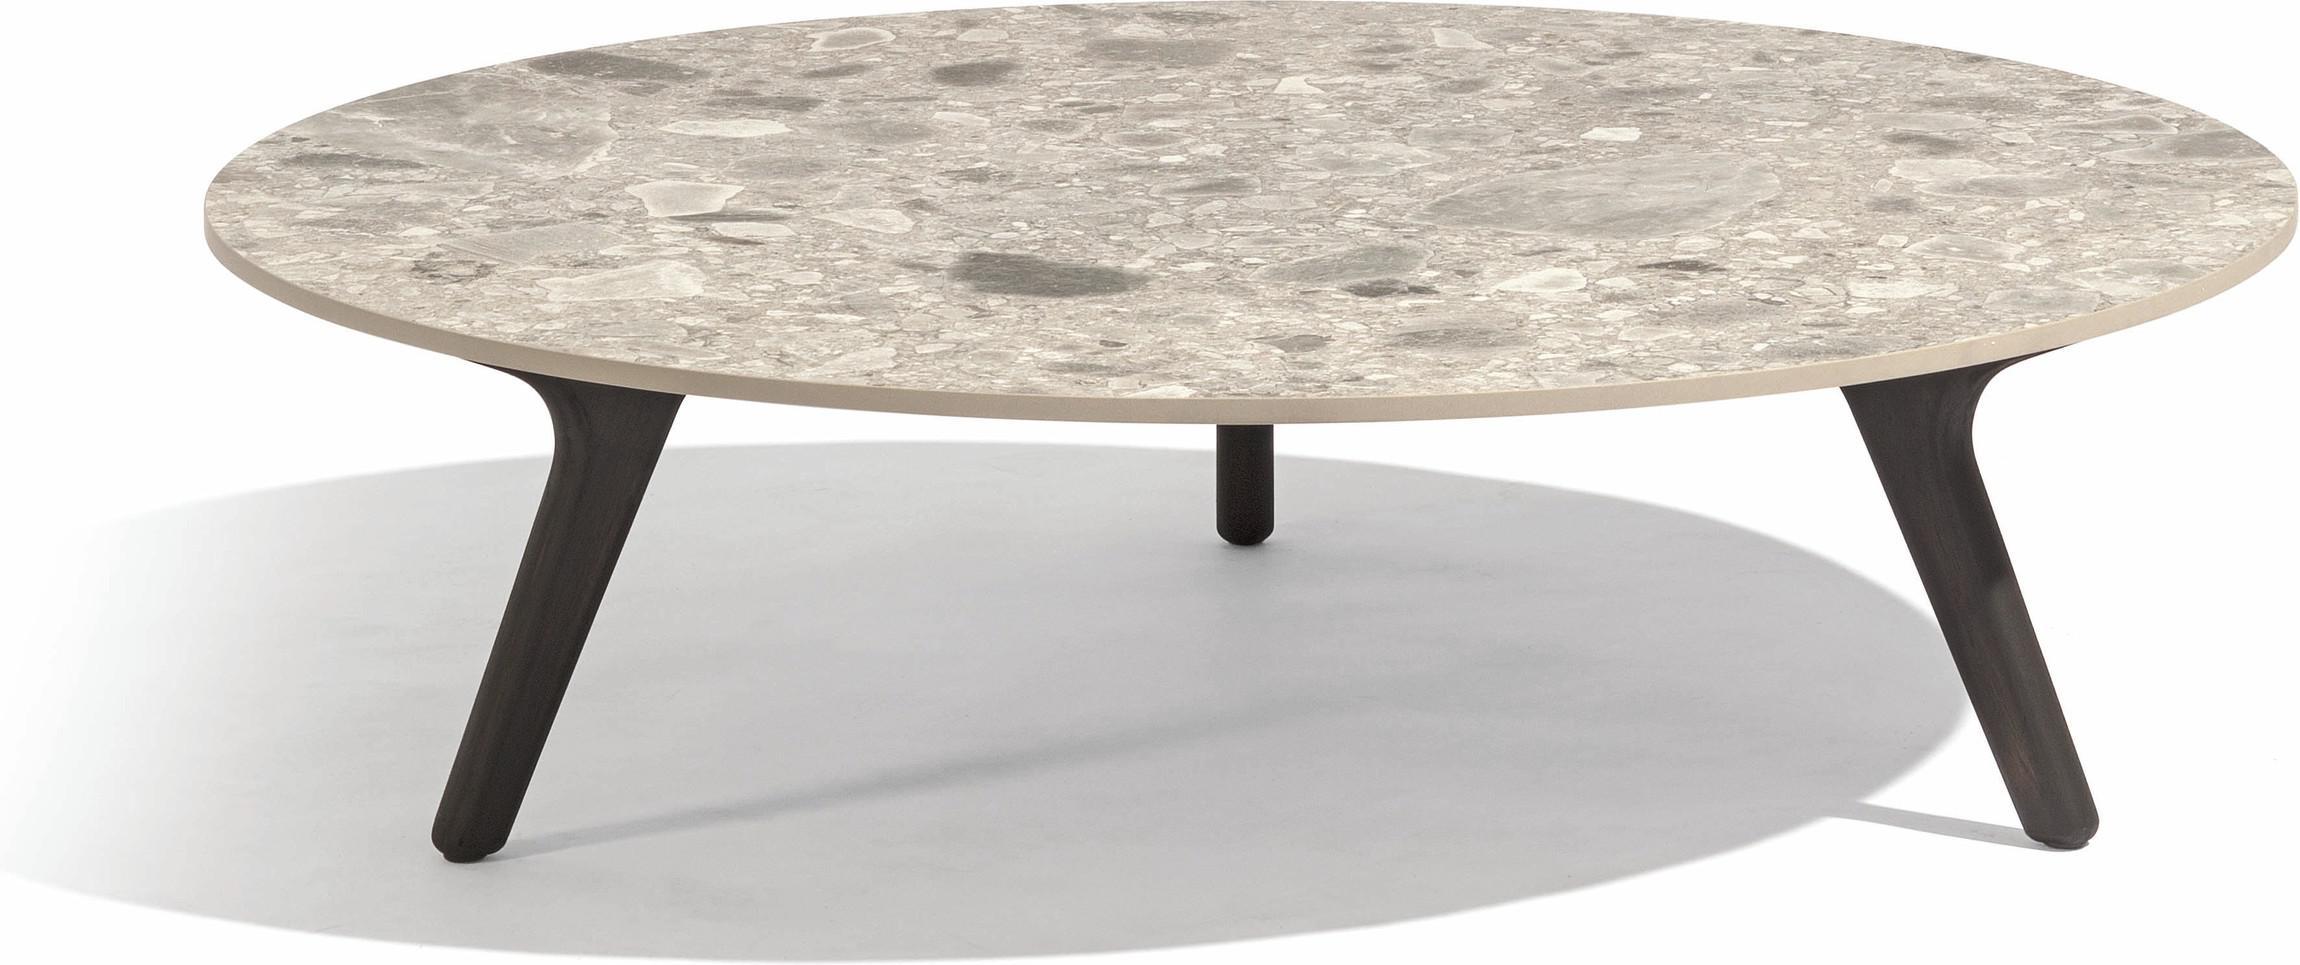 Torsa Low table - Teak nero - CF 90